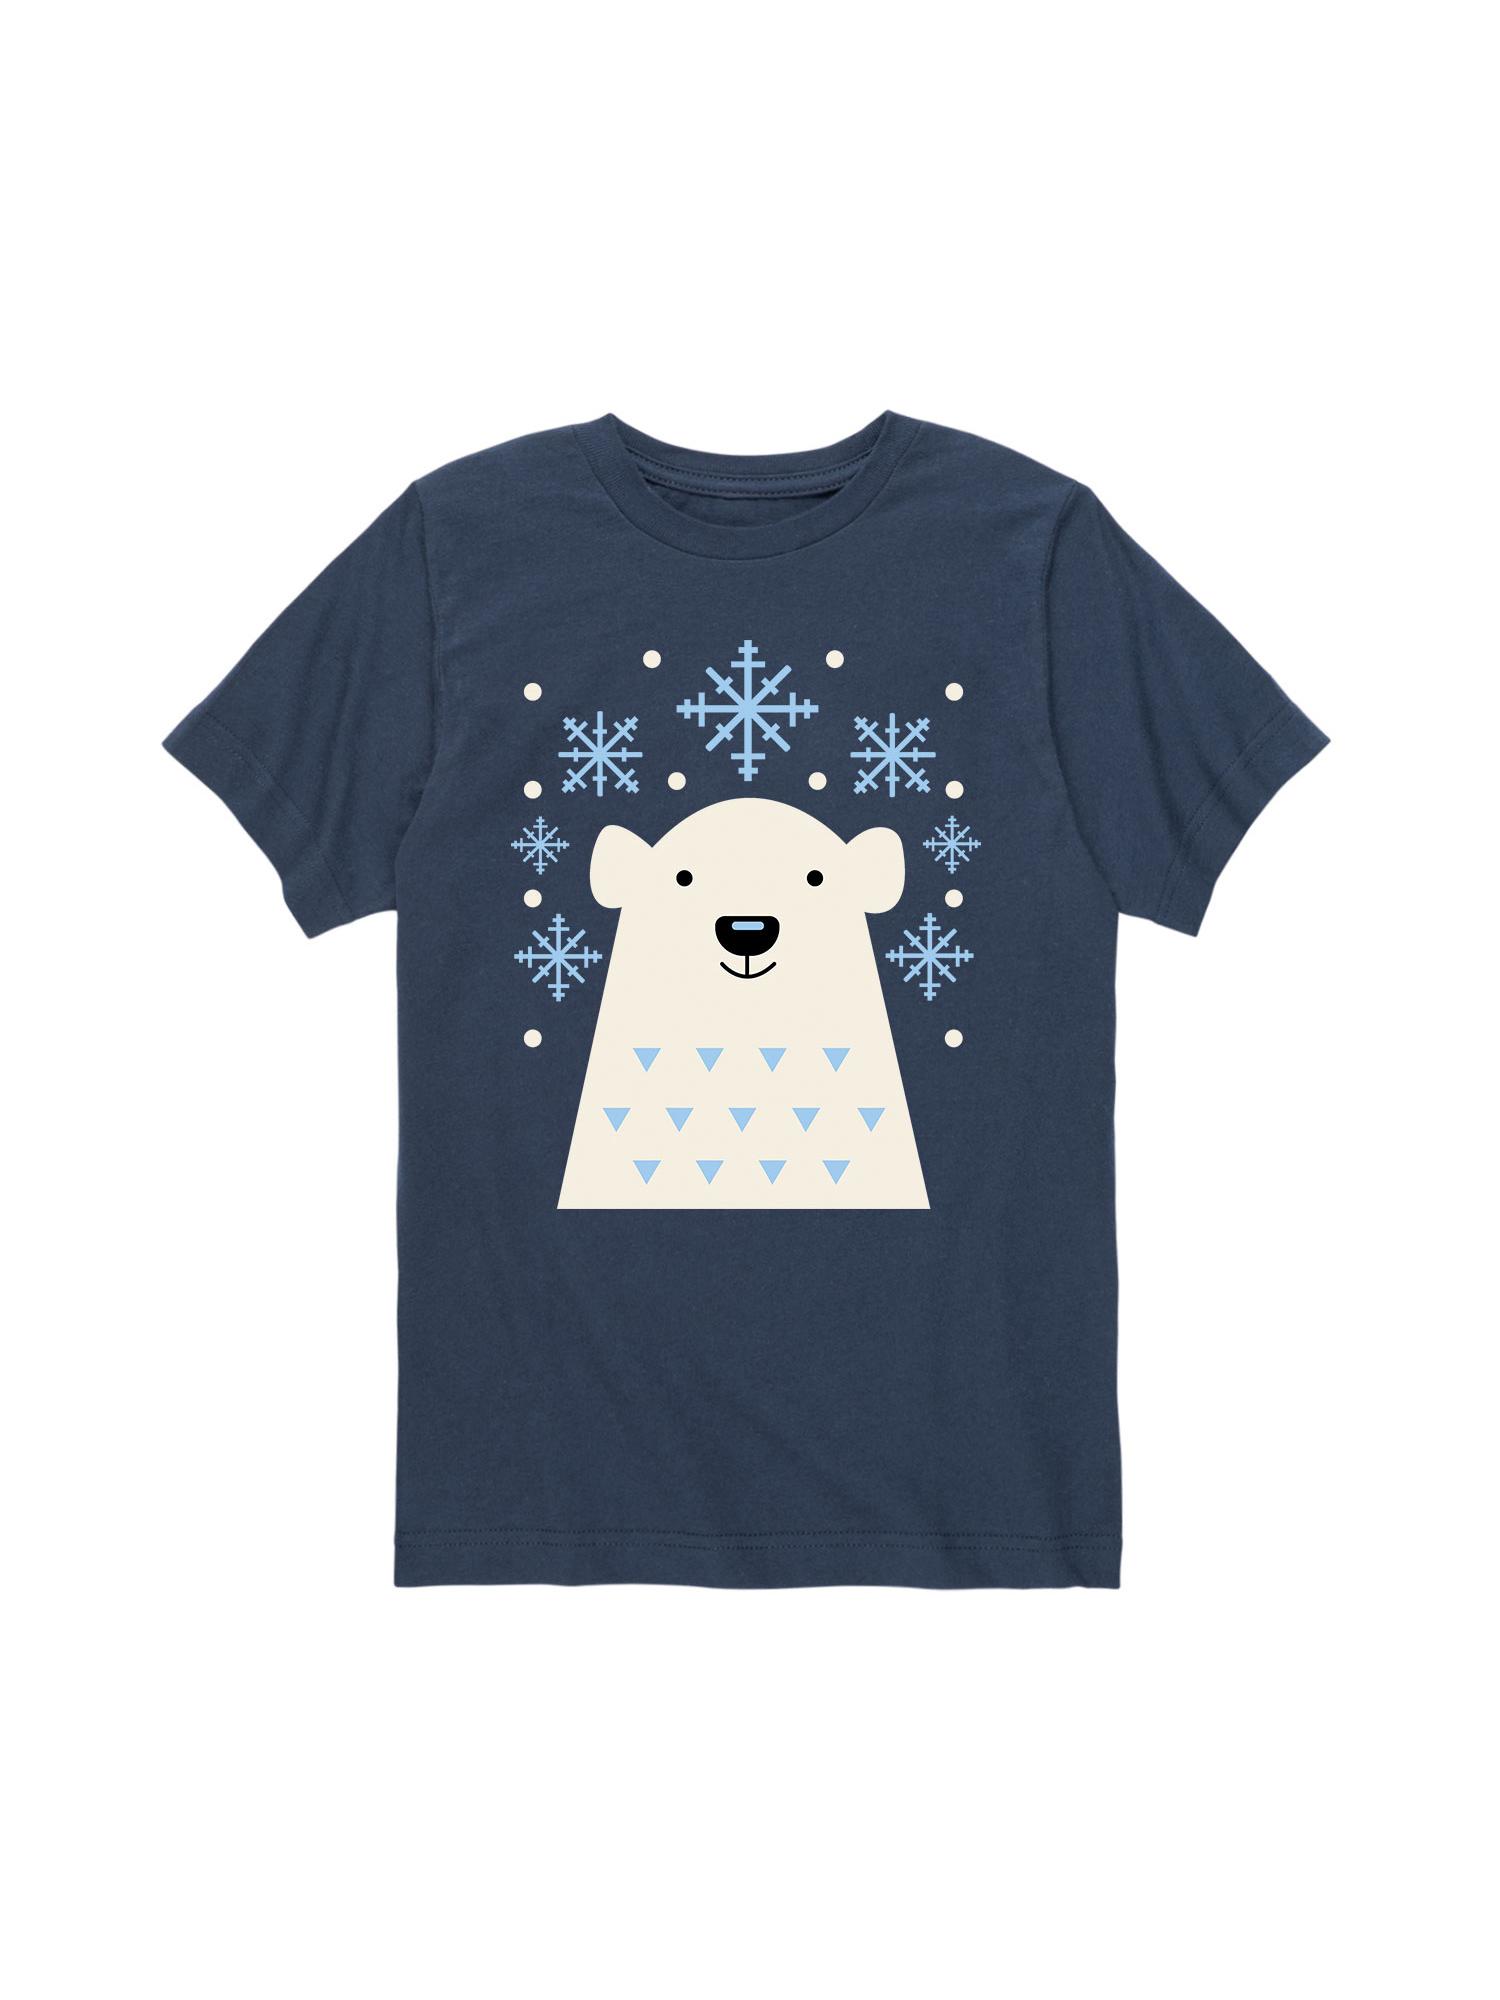 Scandinavian Polar Bear Bottom Hit  - Toddler Short Sleeve Tee